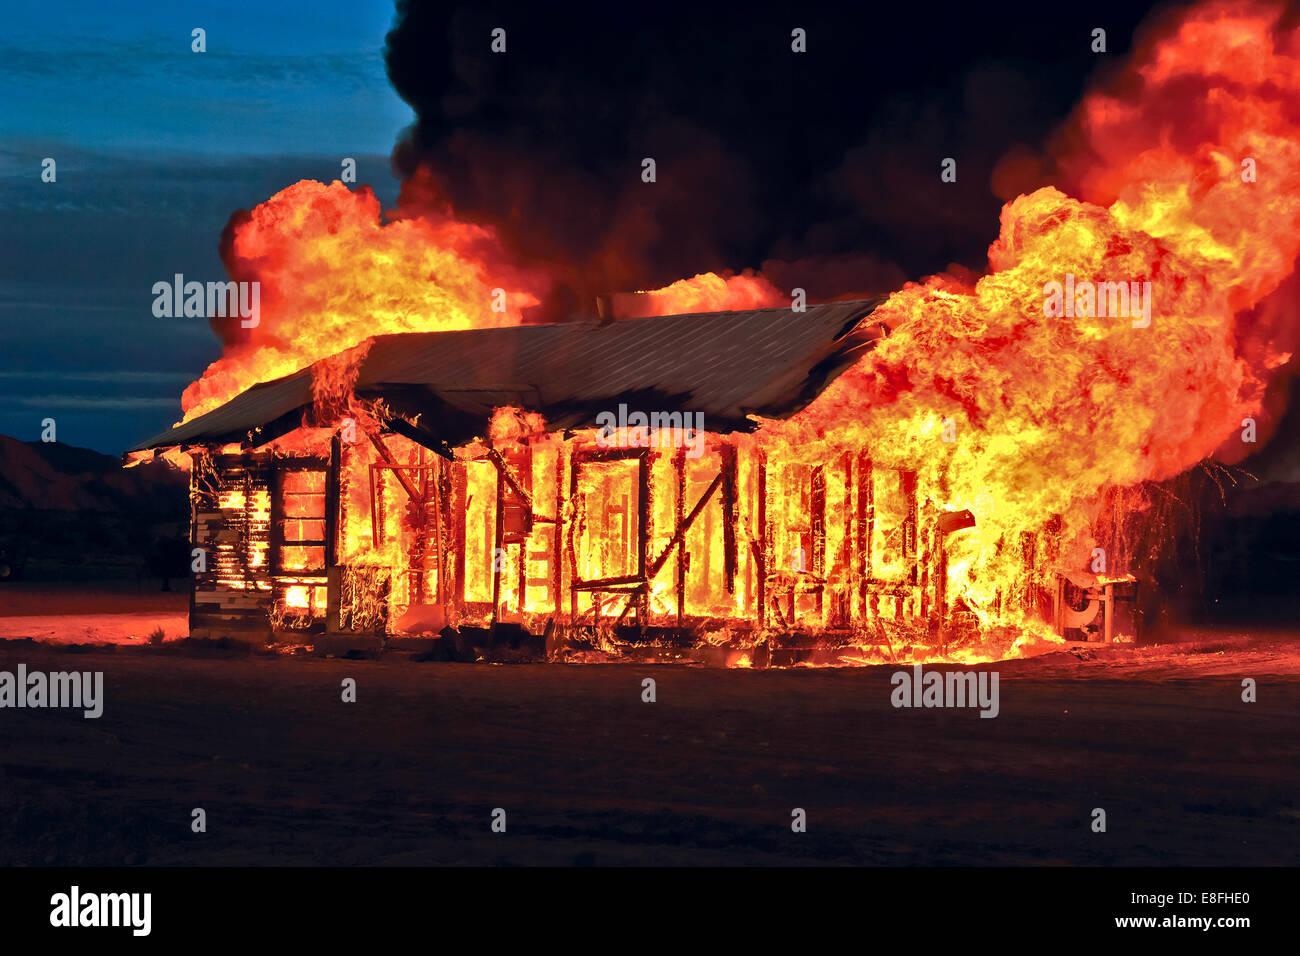 Abandoned house on fire, Gila Bend, Arizona, America, USA - Stock Image